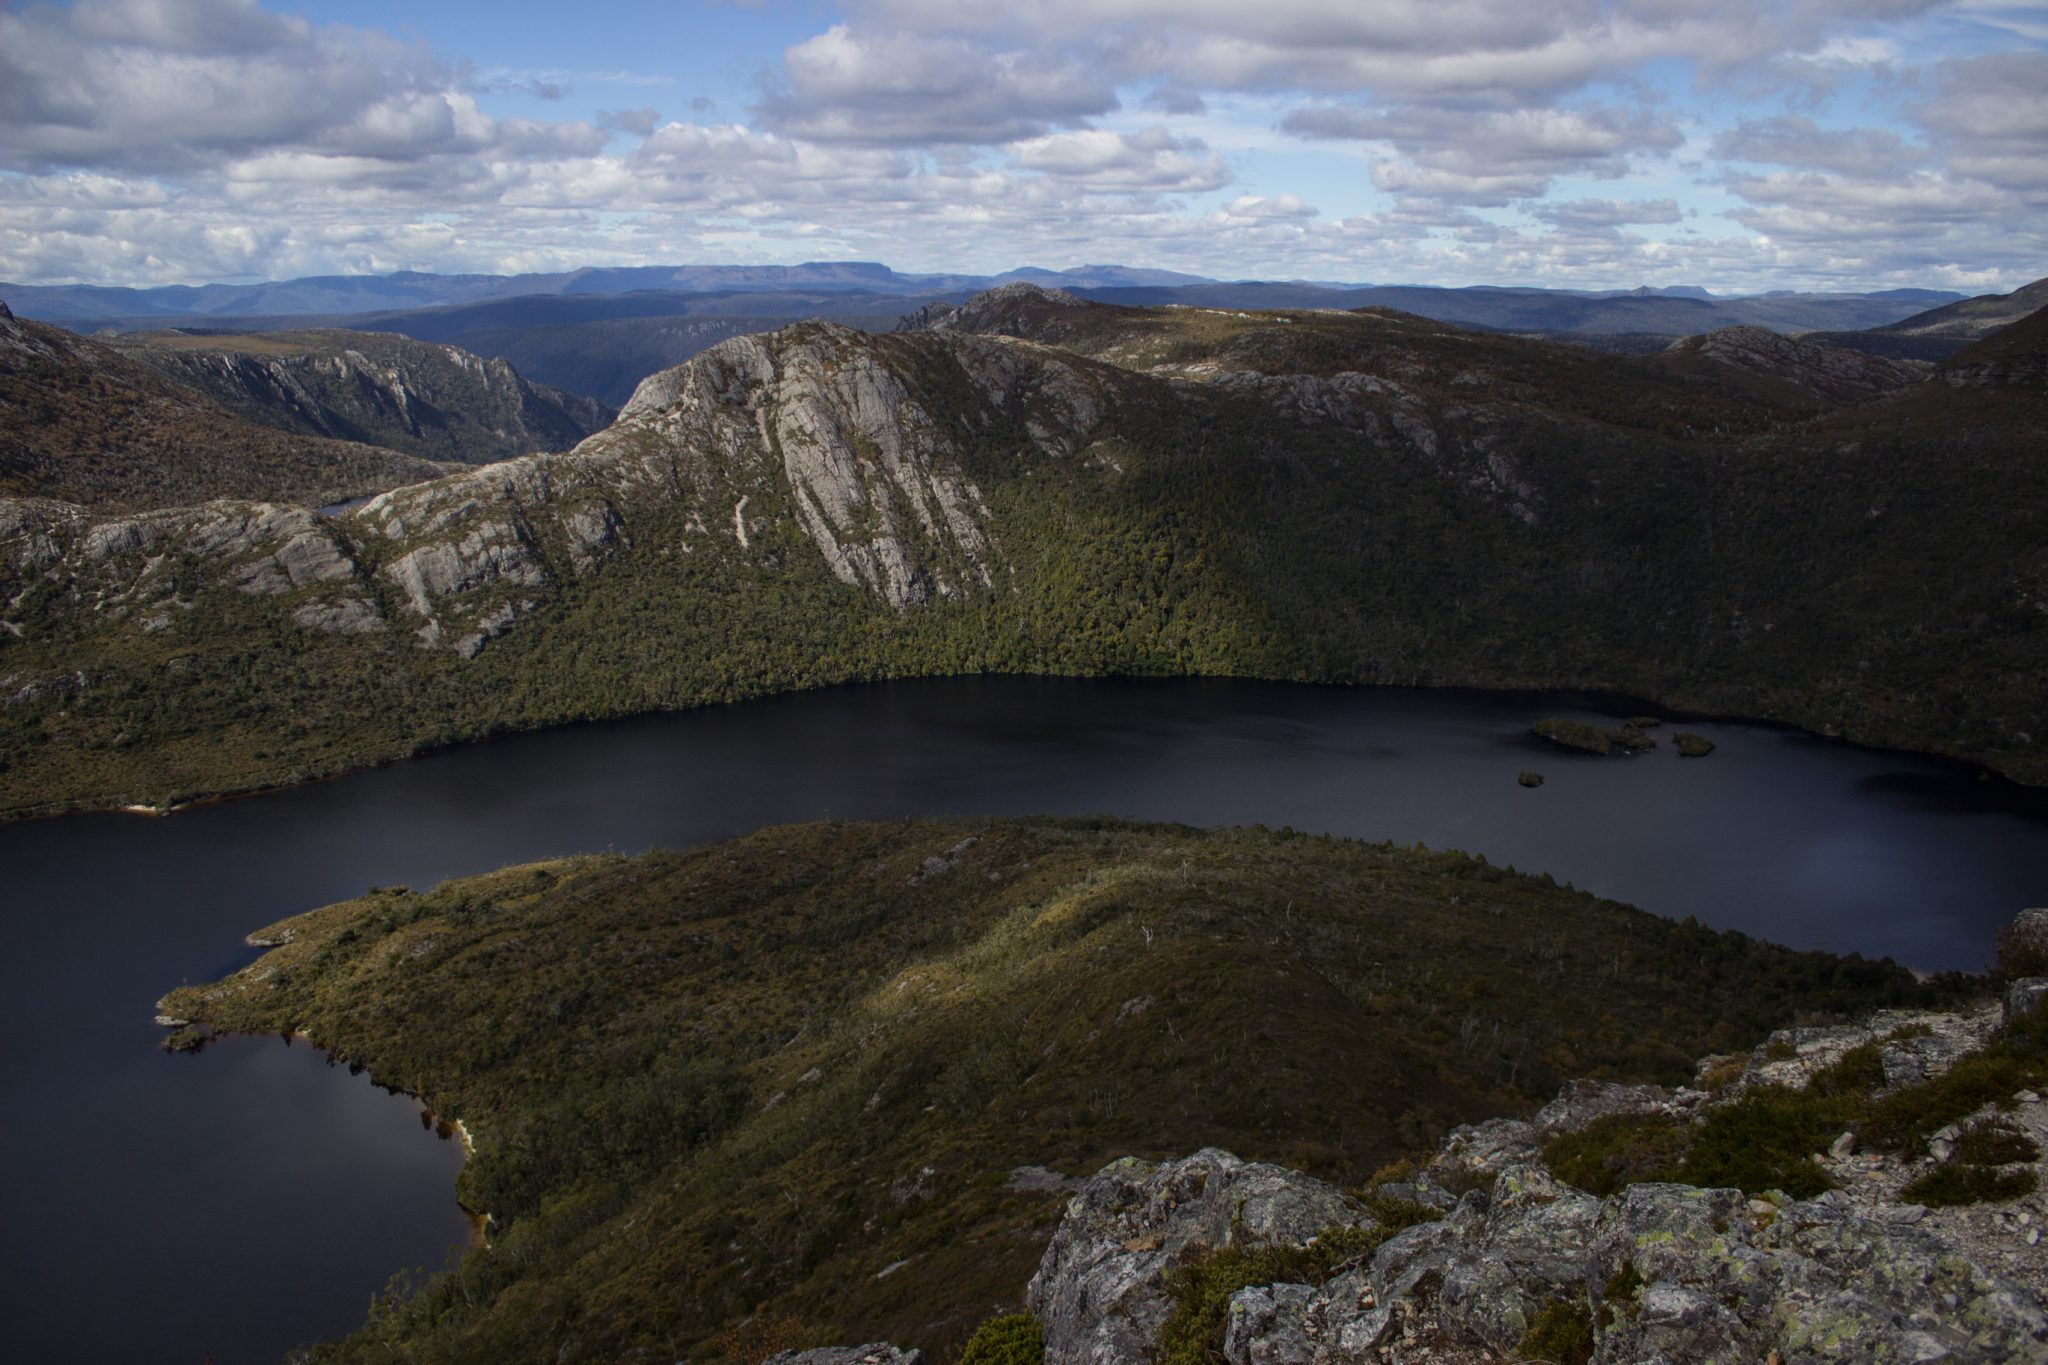 Ronny Creek bis Marions Lookout, Aussichtspunkt, Wanderung Overland Track im Cradle Mountain Lake St. Clair National Park, raue Gebirgslandschaft, schöner See, Ende des Sommers in Tasmanien, Bäume